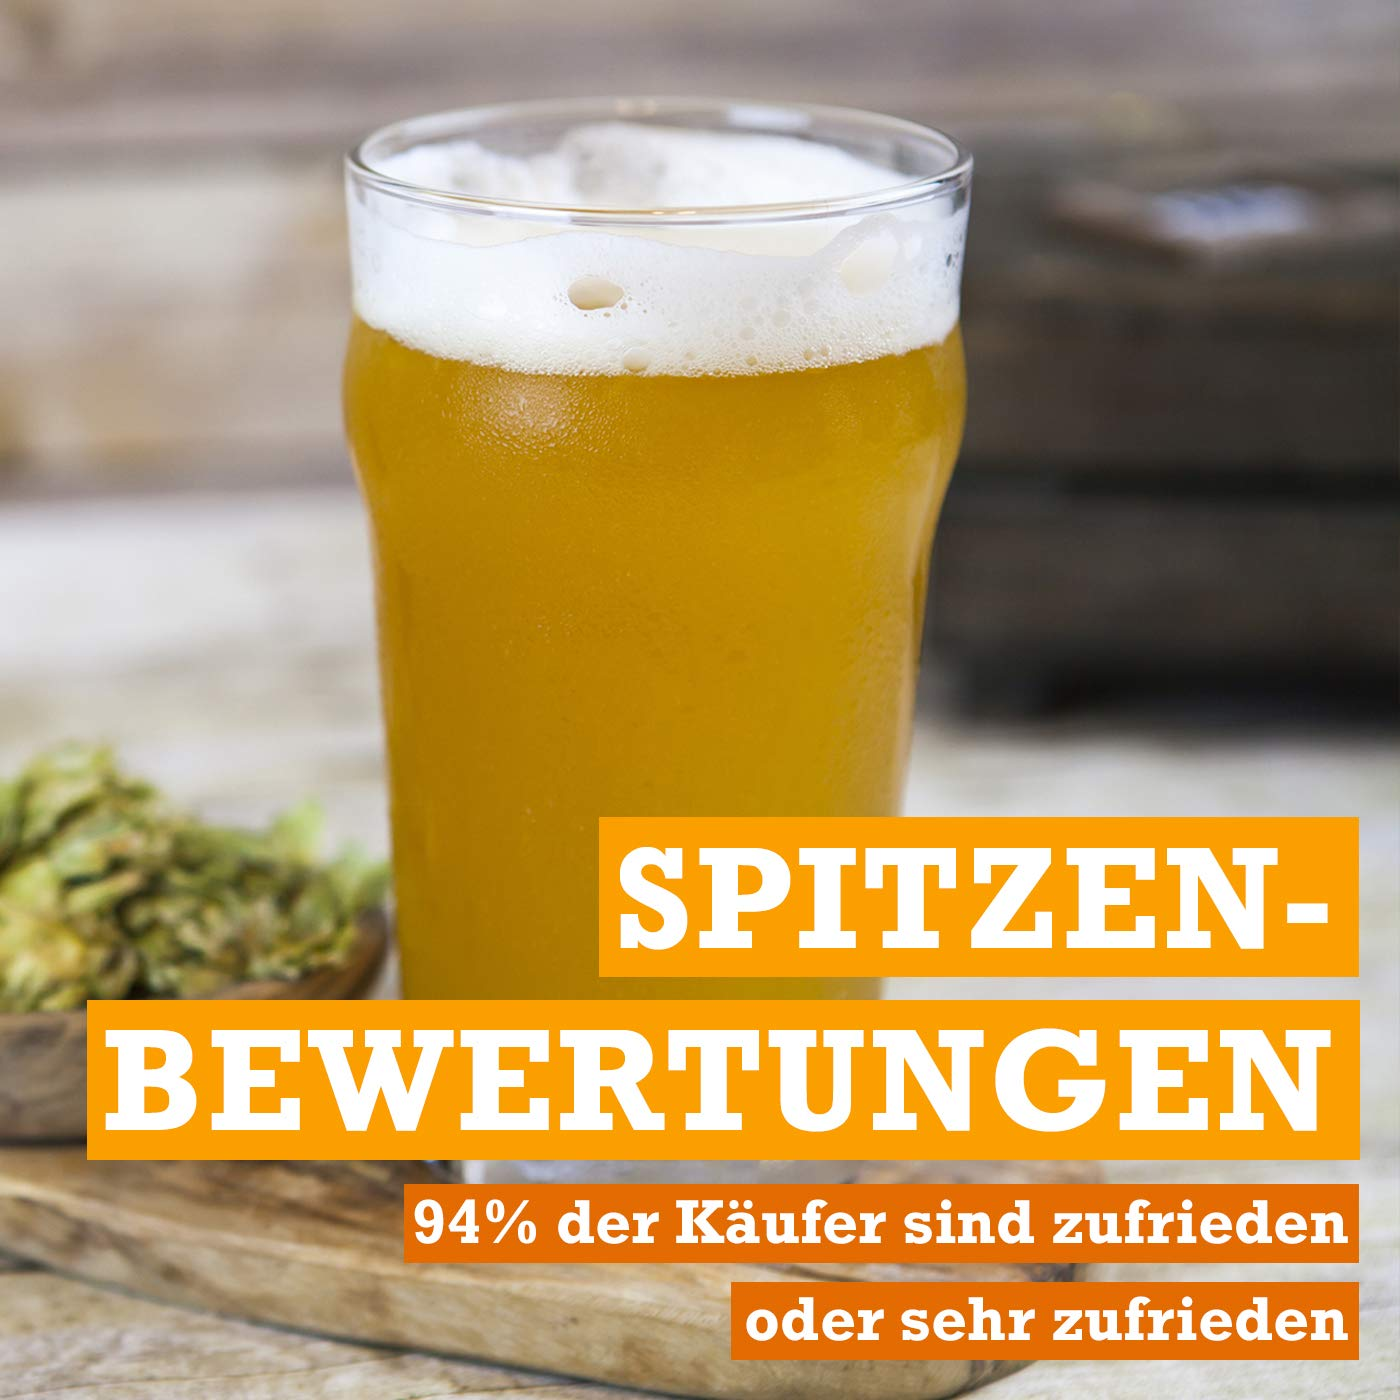 Feinschmecker Bierbrauset Weizenbier Selber Brauen Neu Hefe Weizen Bier Set Geschenk Brew Beer Grade Produkte Nach QualitäT